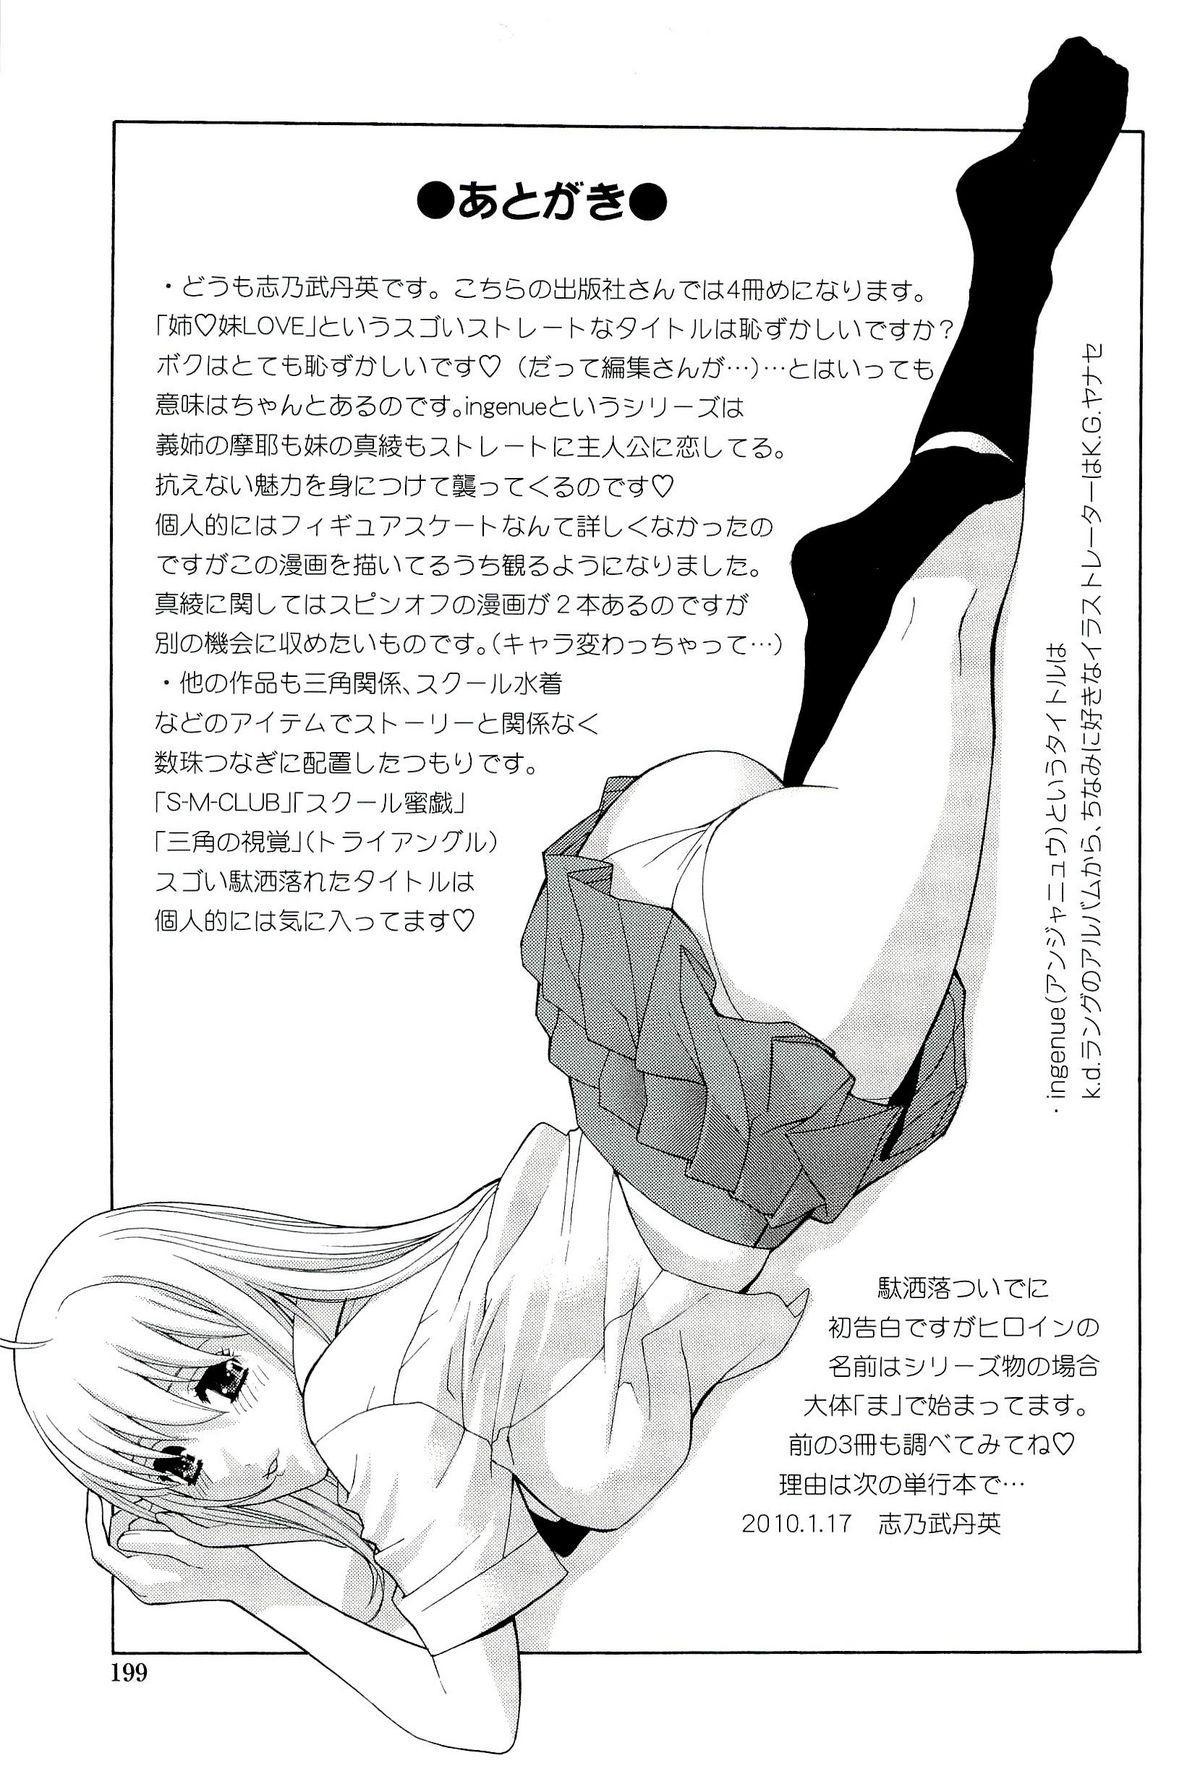 [Shinobu Tanei] Ane ♡ Imouto Love | Big-Sis Lil-Sis Love [English] {Tadanohito} 199